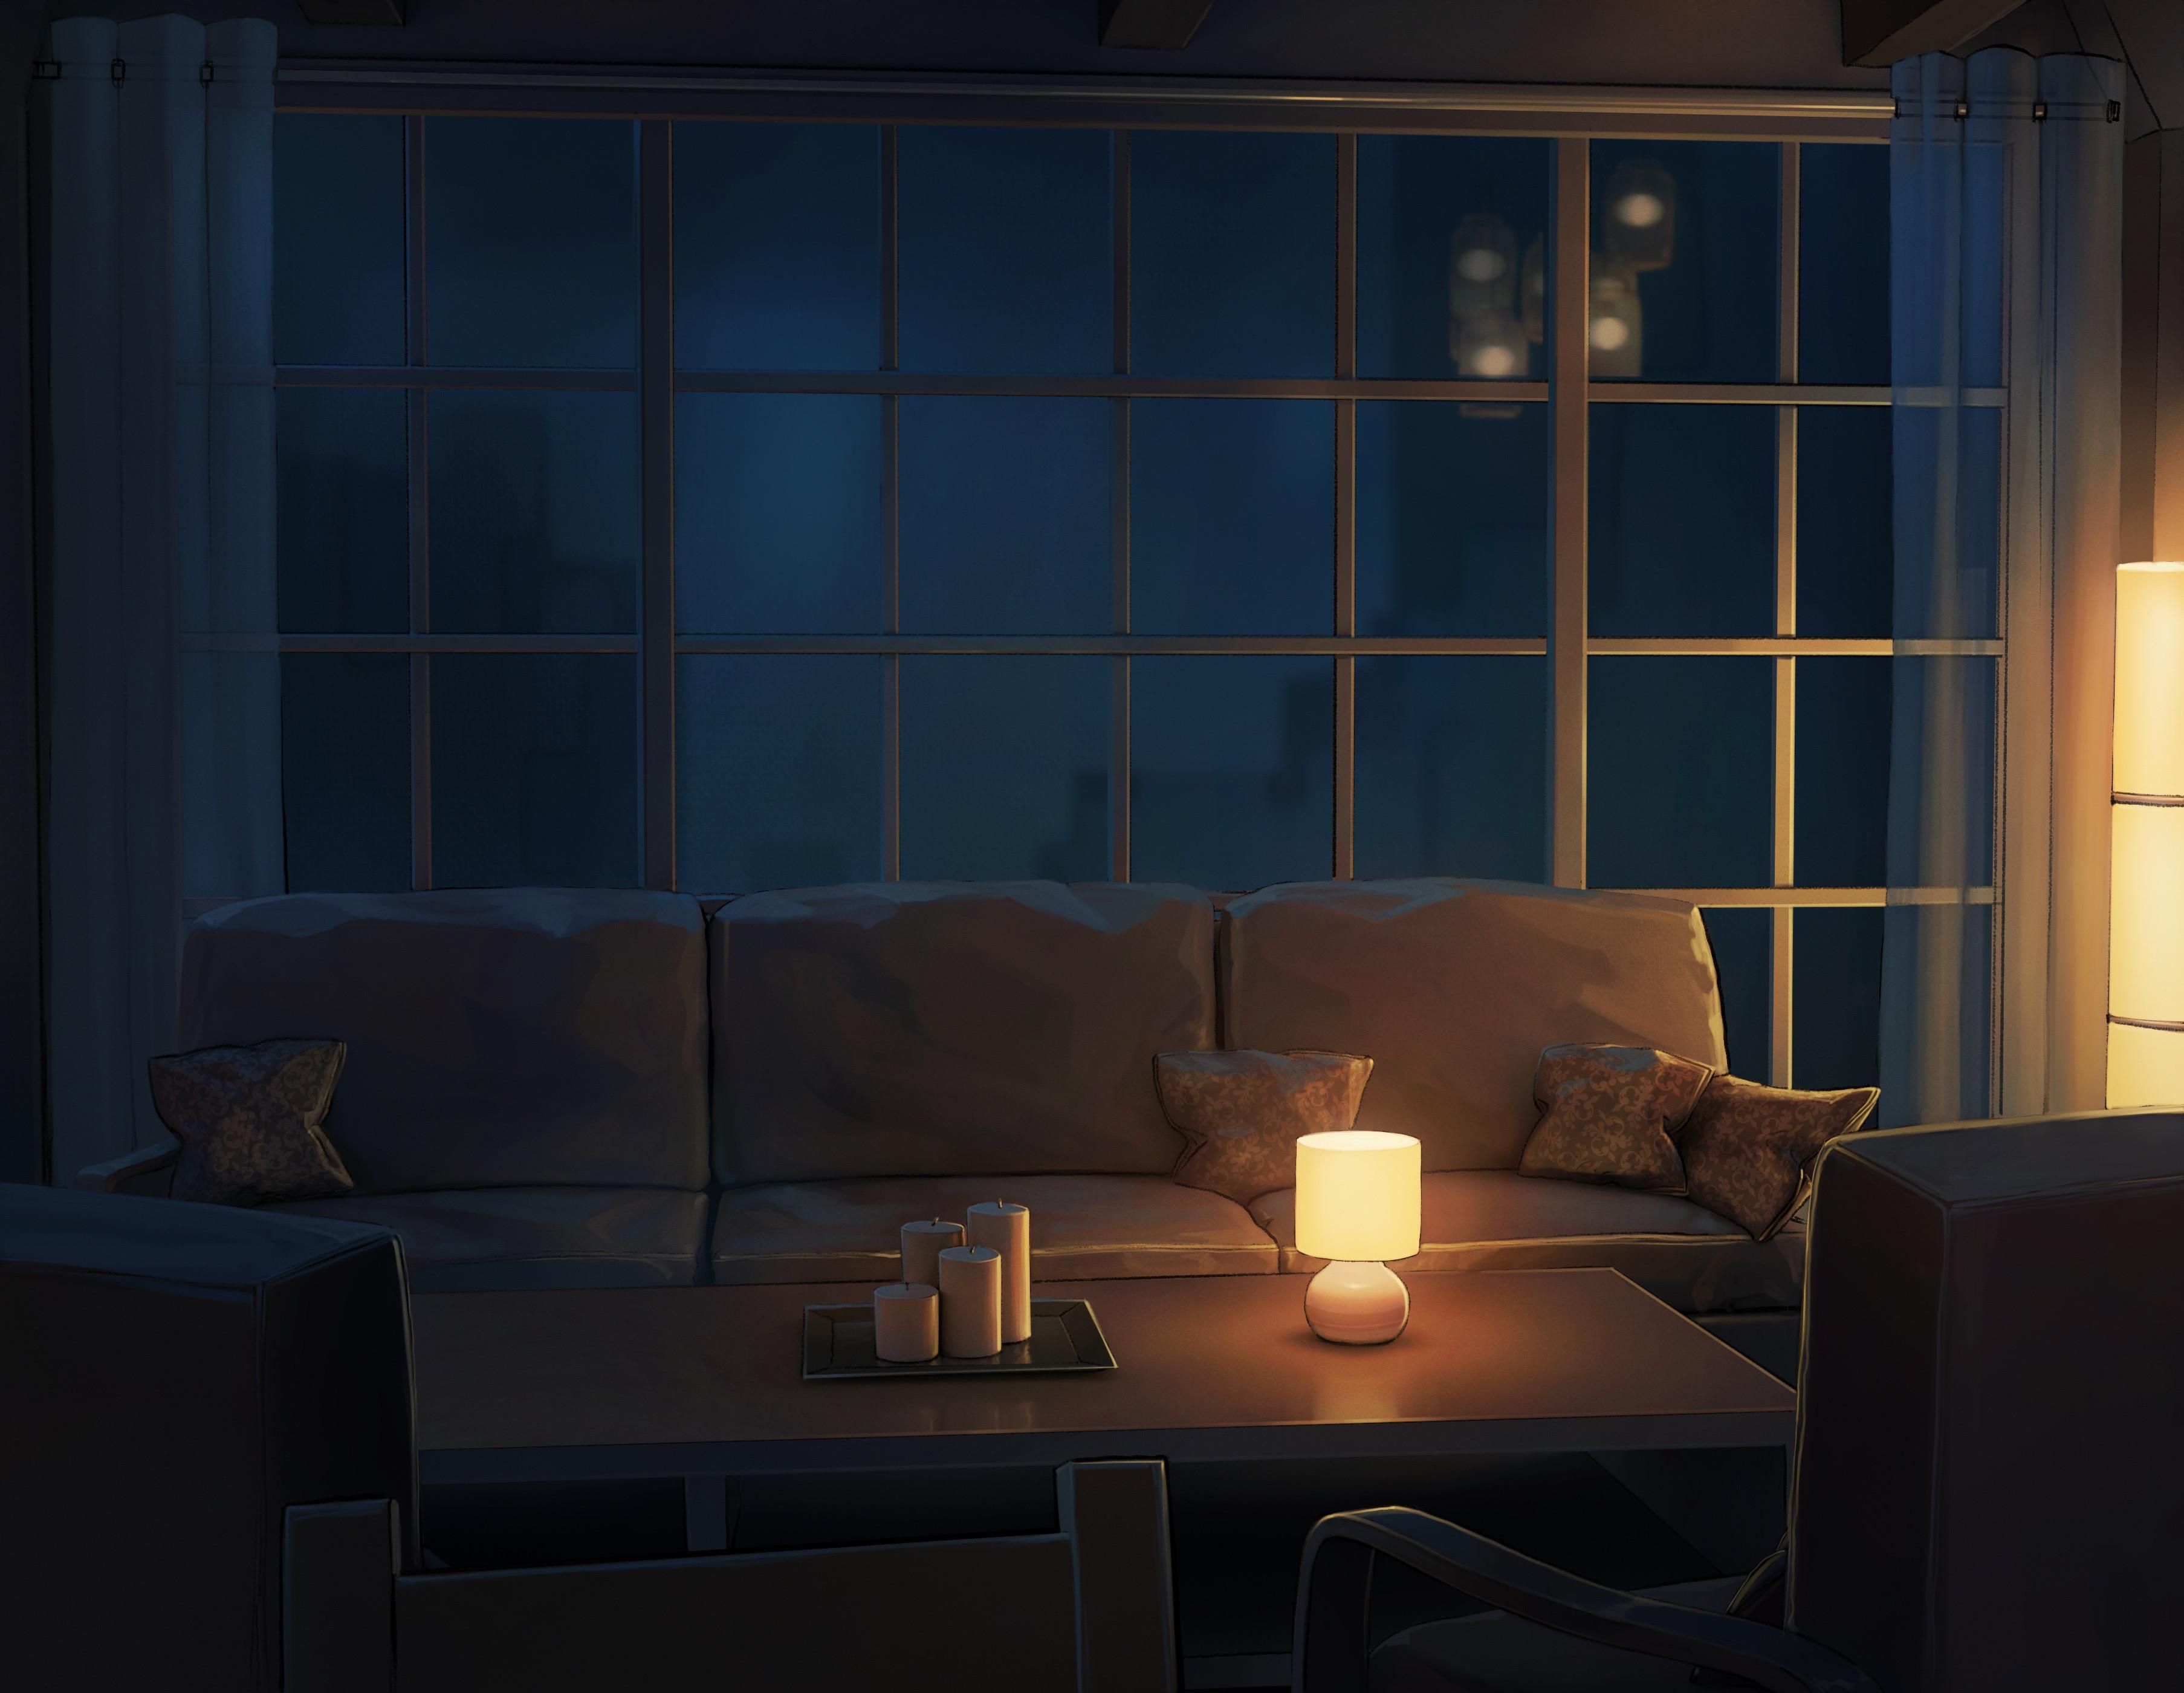 Living room - final background